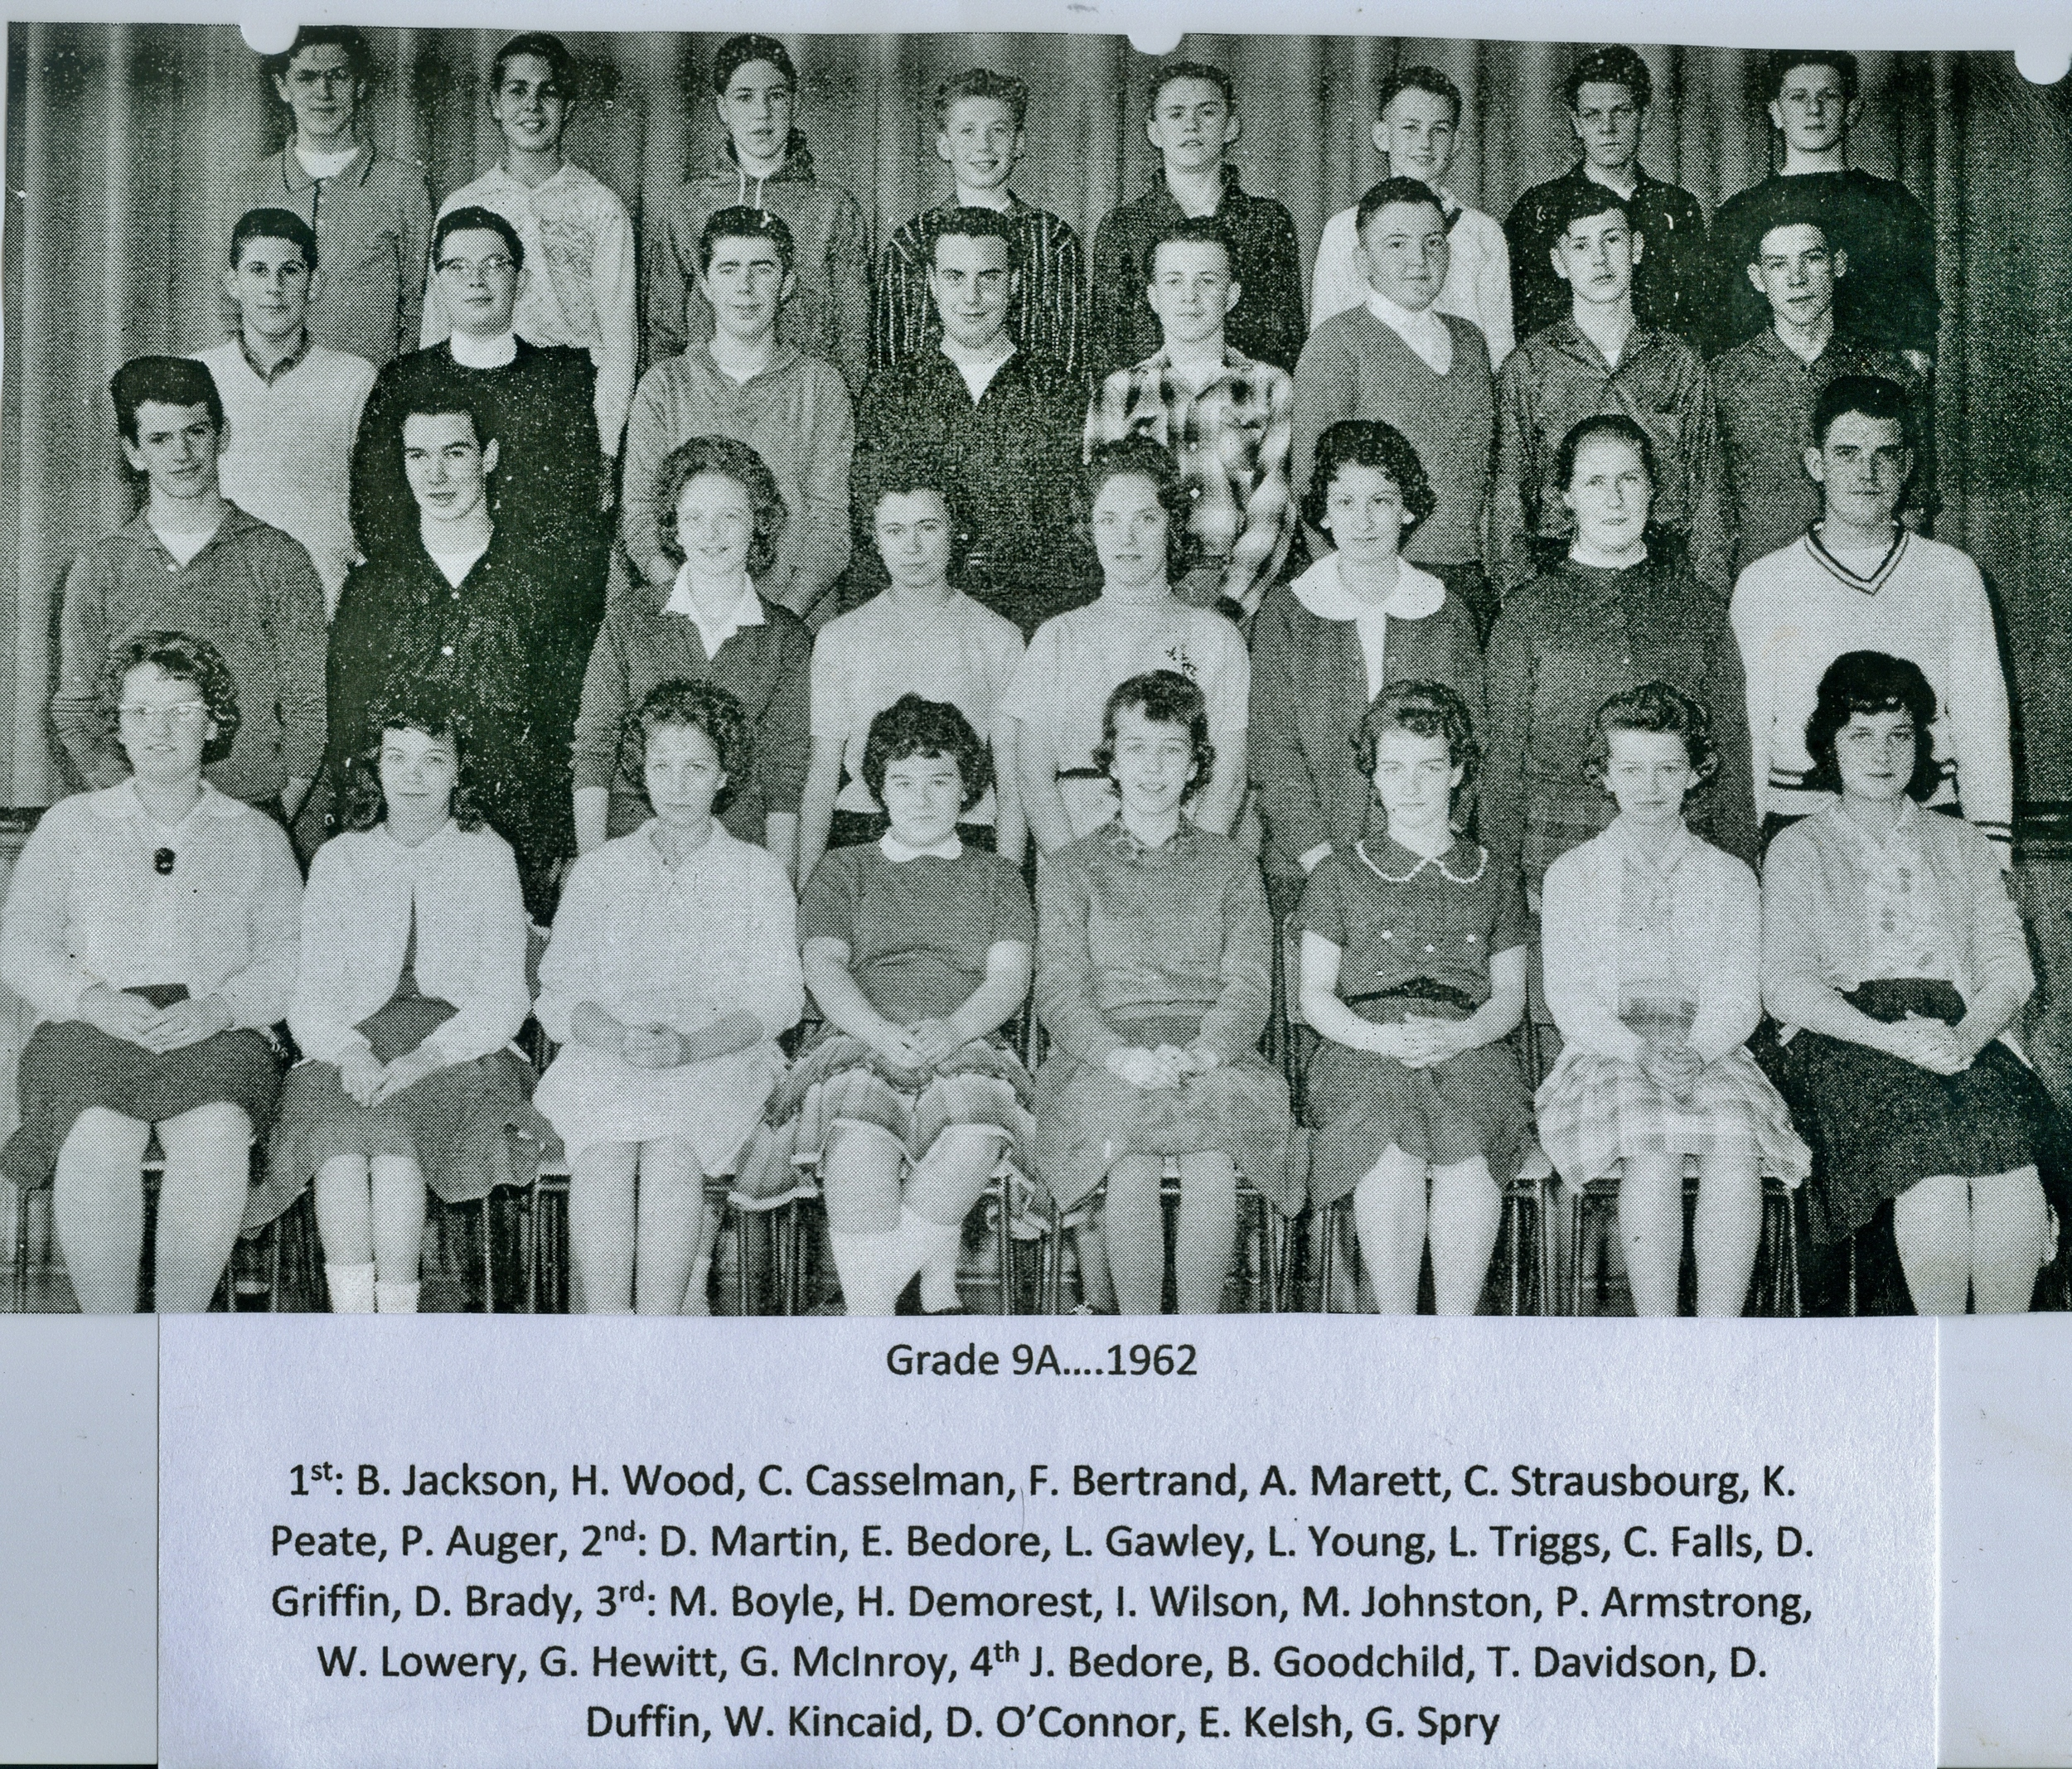 High school 9A  1962.jpg